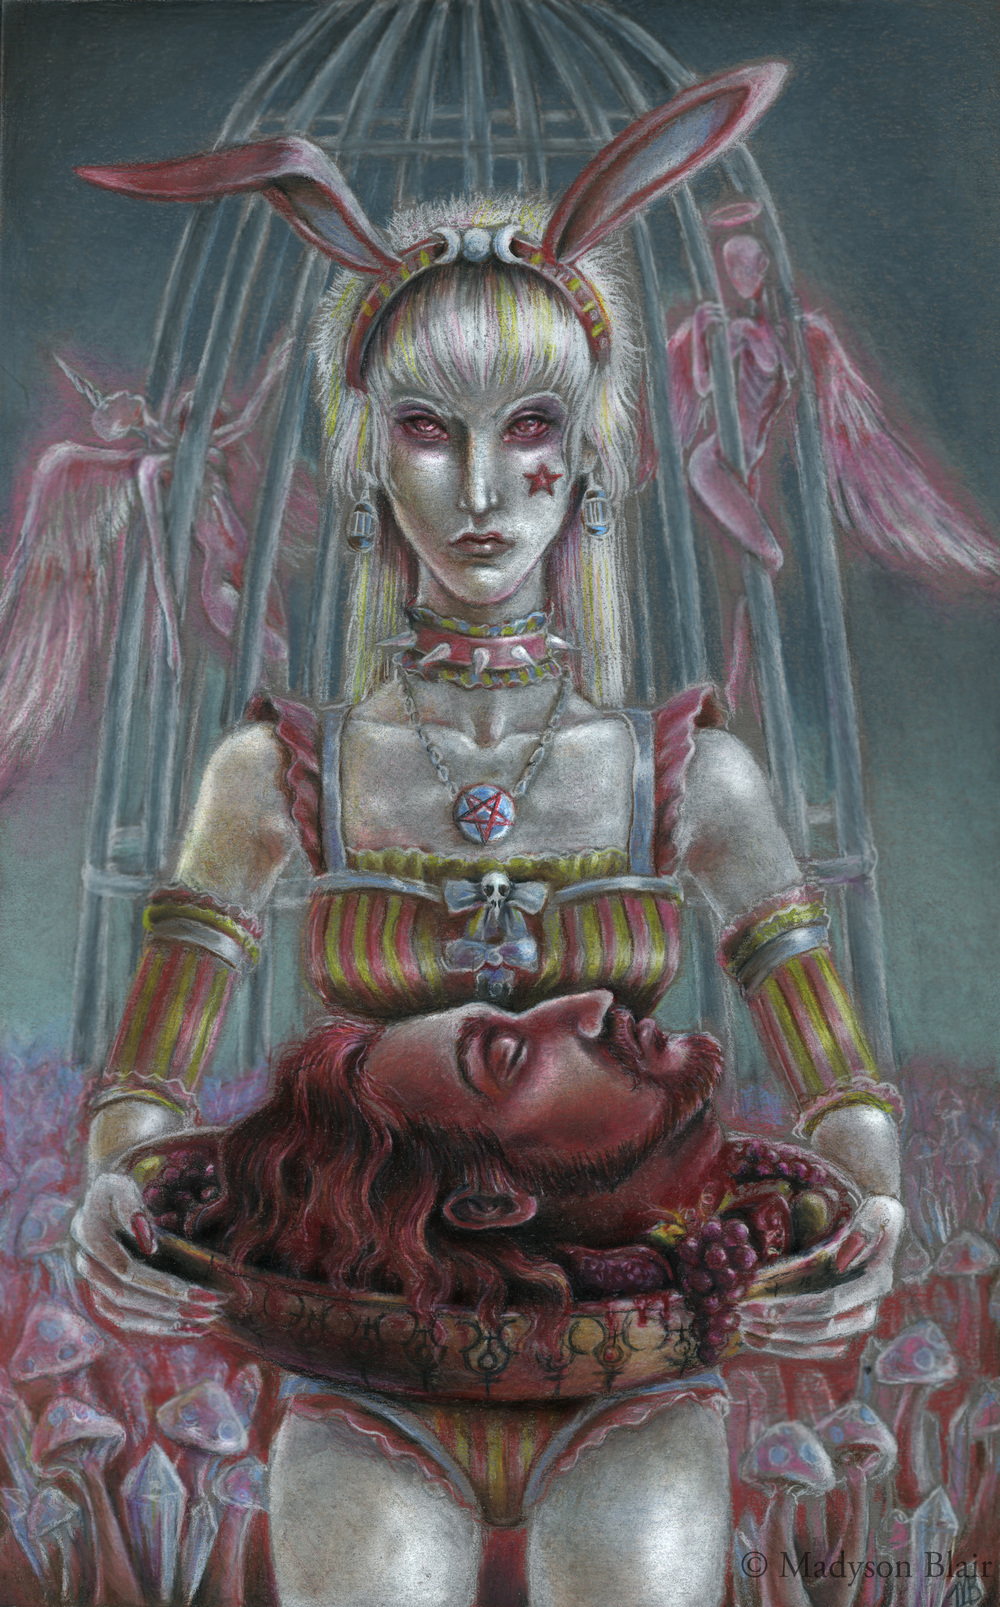 'The High Priestess'